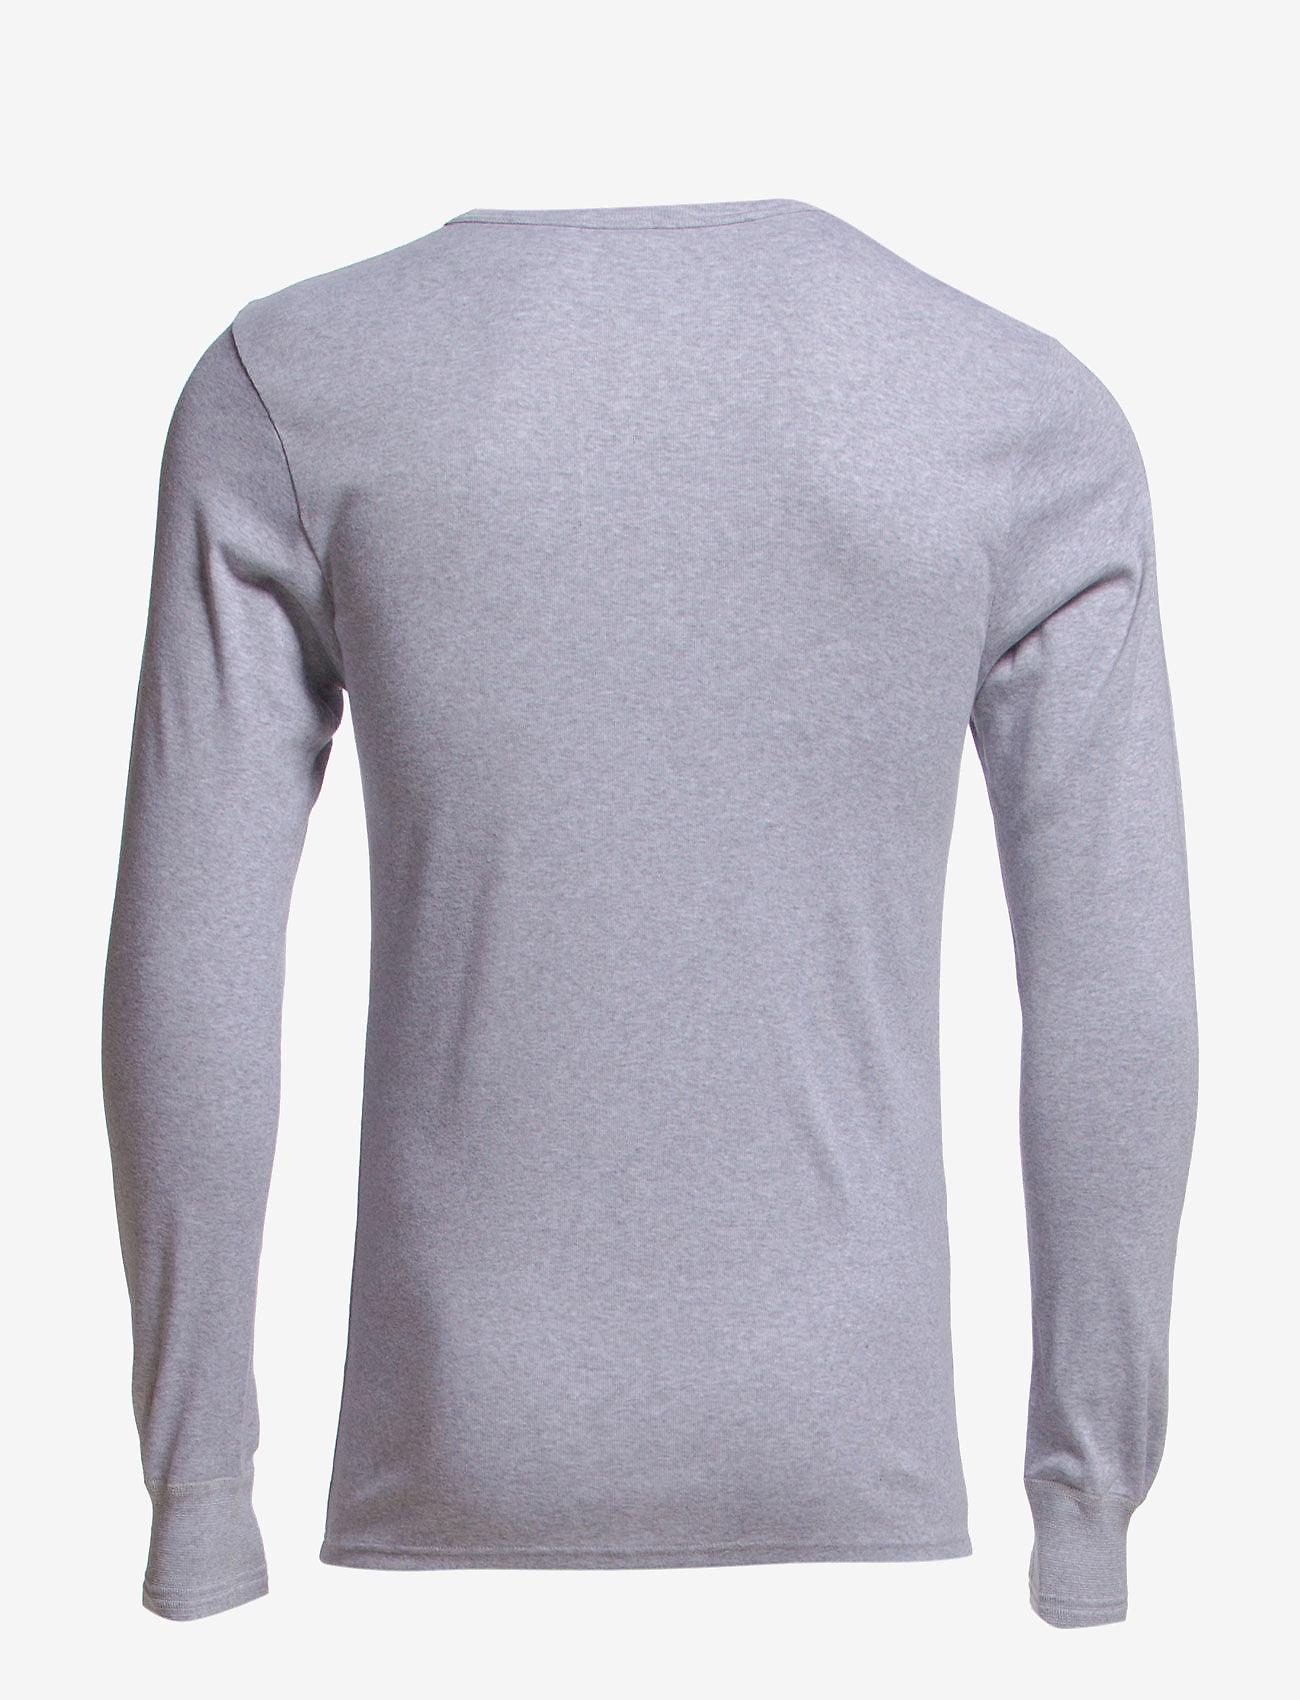 Dovre - Dovre T-shirt Long sleeves - t-krekli ar garām piedurknēm - grey melan - 1